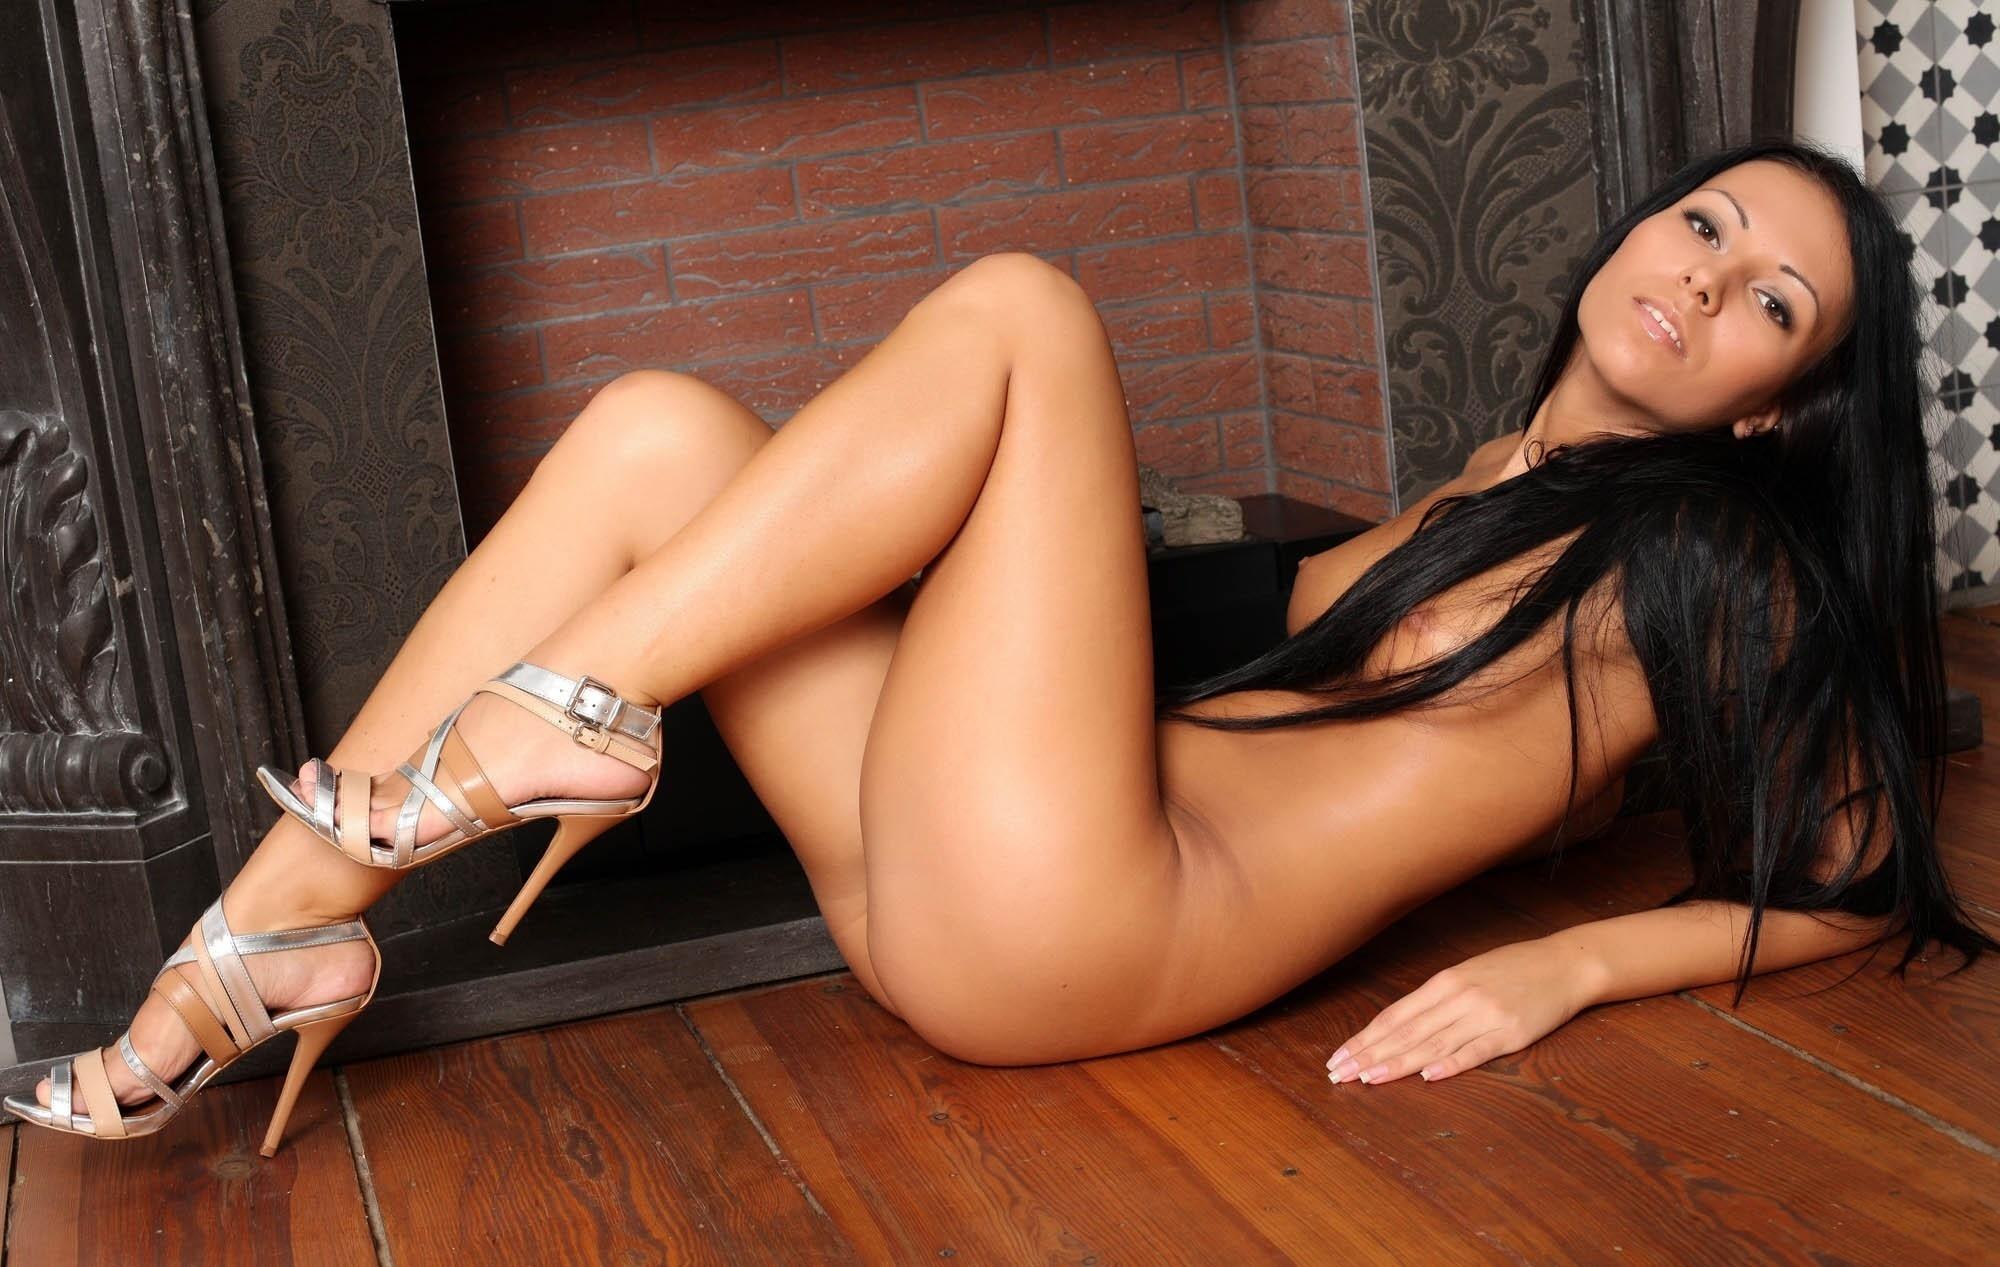 women-with-long-legs-naked-natalya-neidhart-pussy